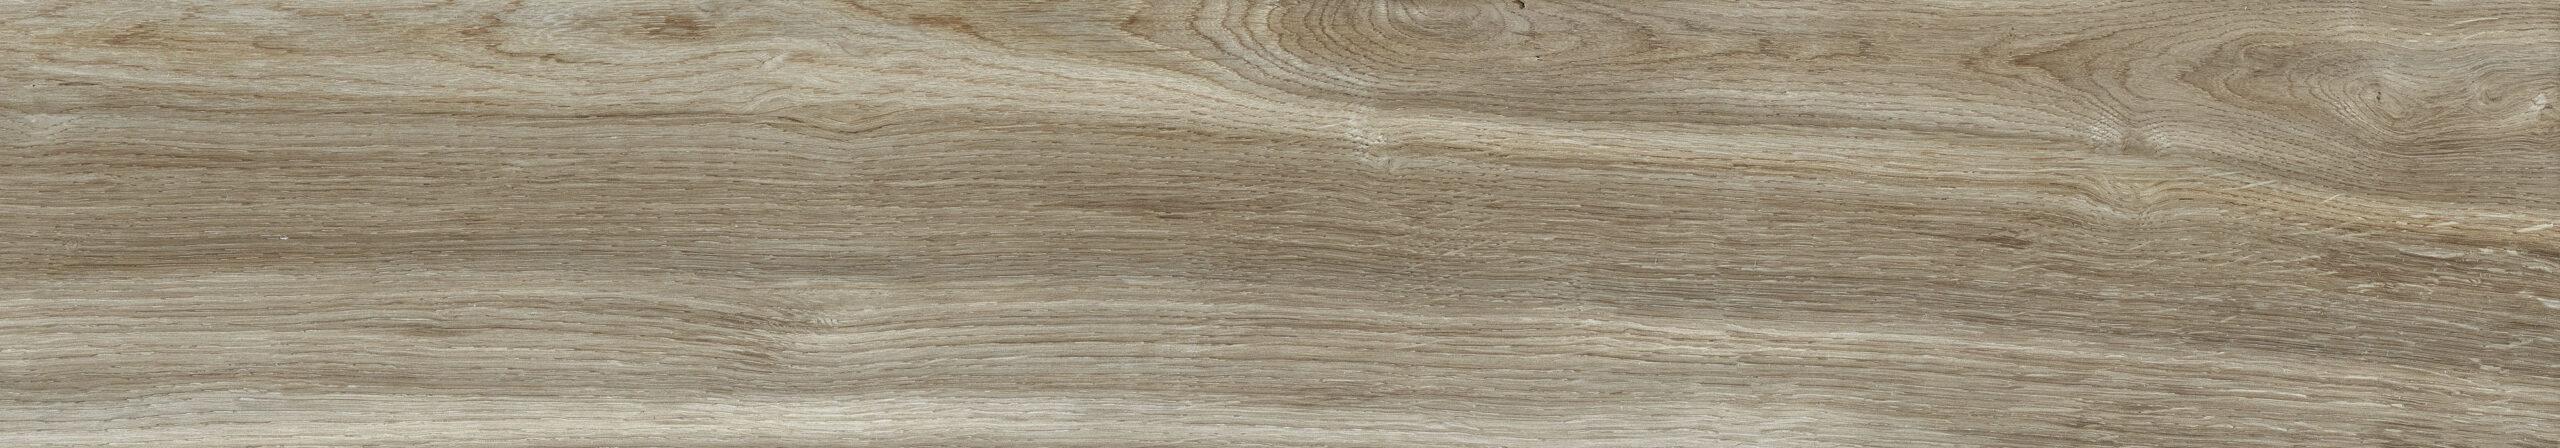 Essential Wood Olive 20x114cm